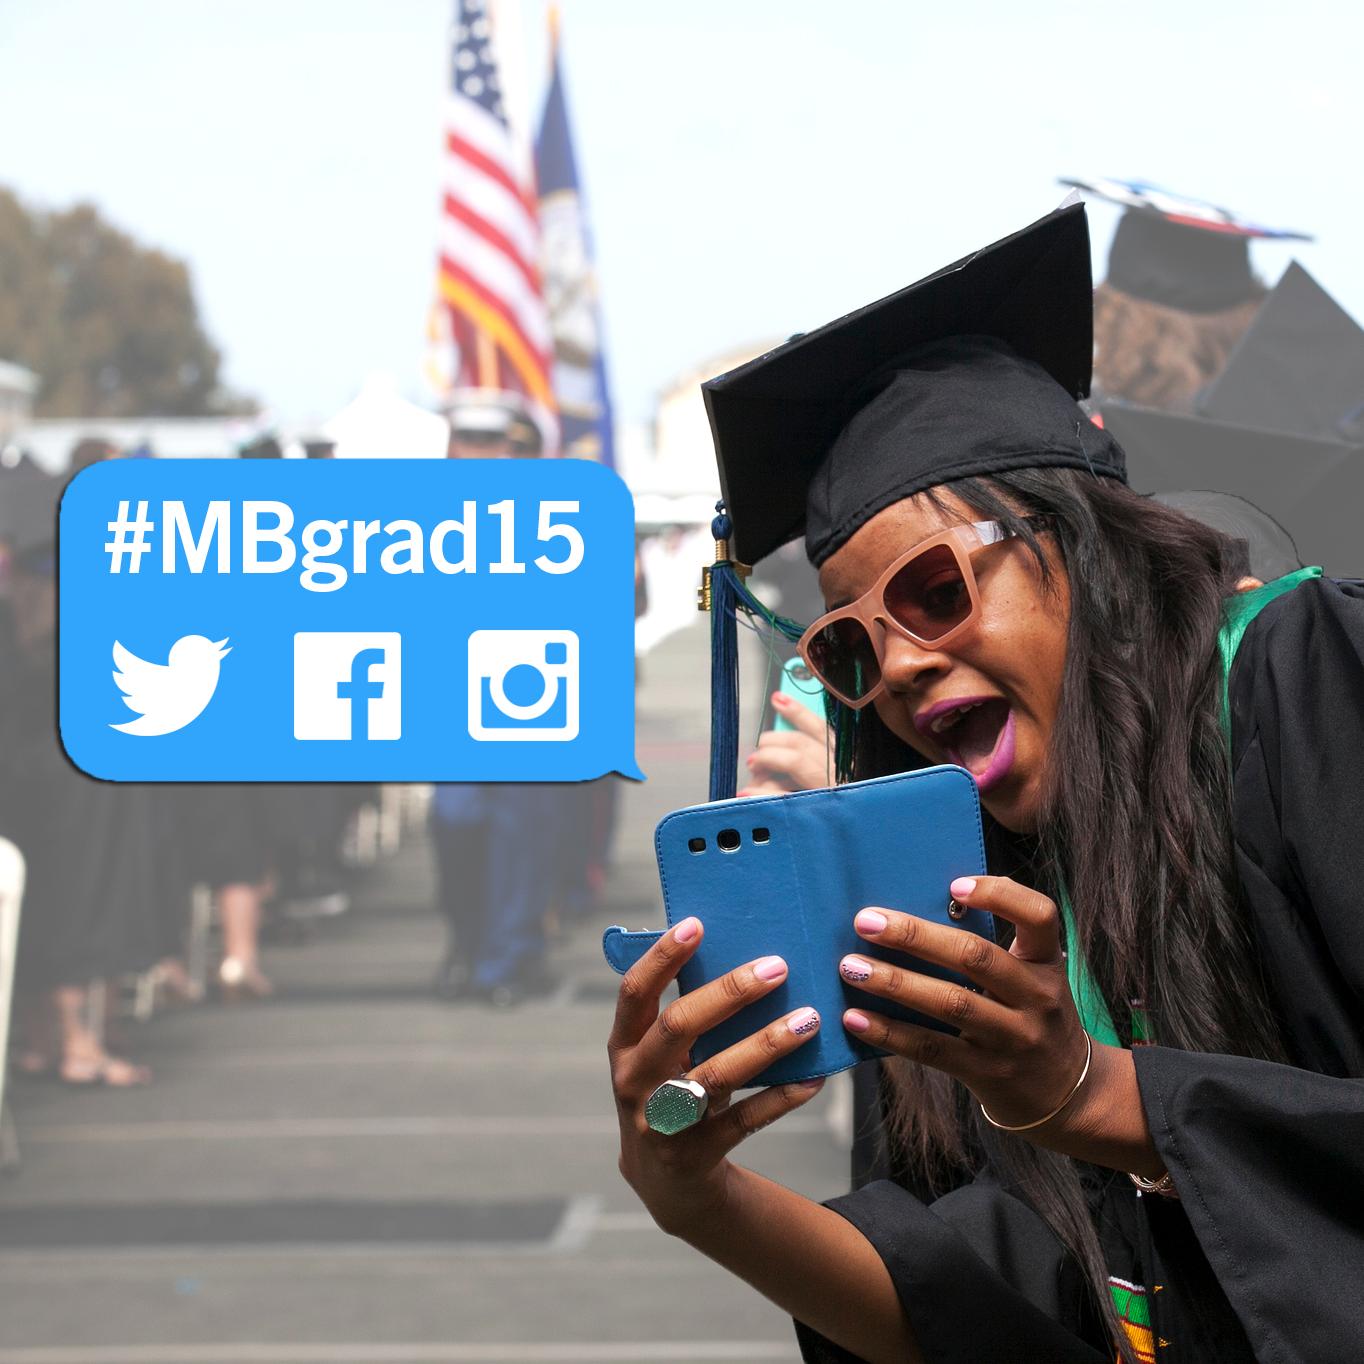 Use hashtag MBgrad17 on social media